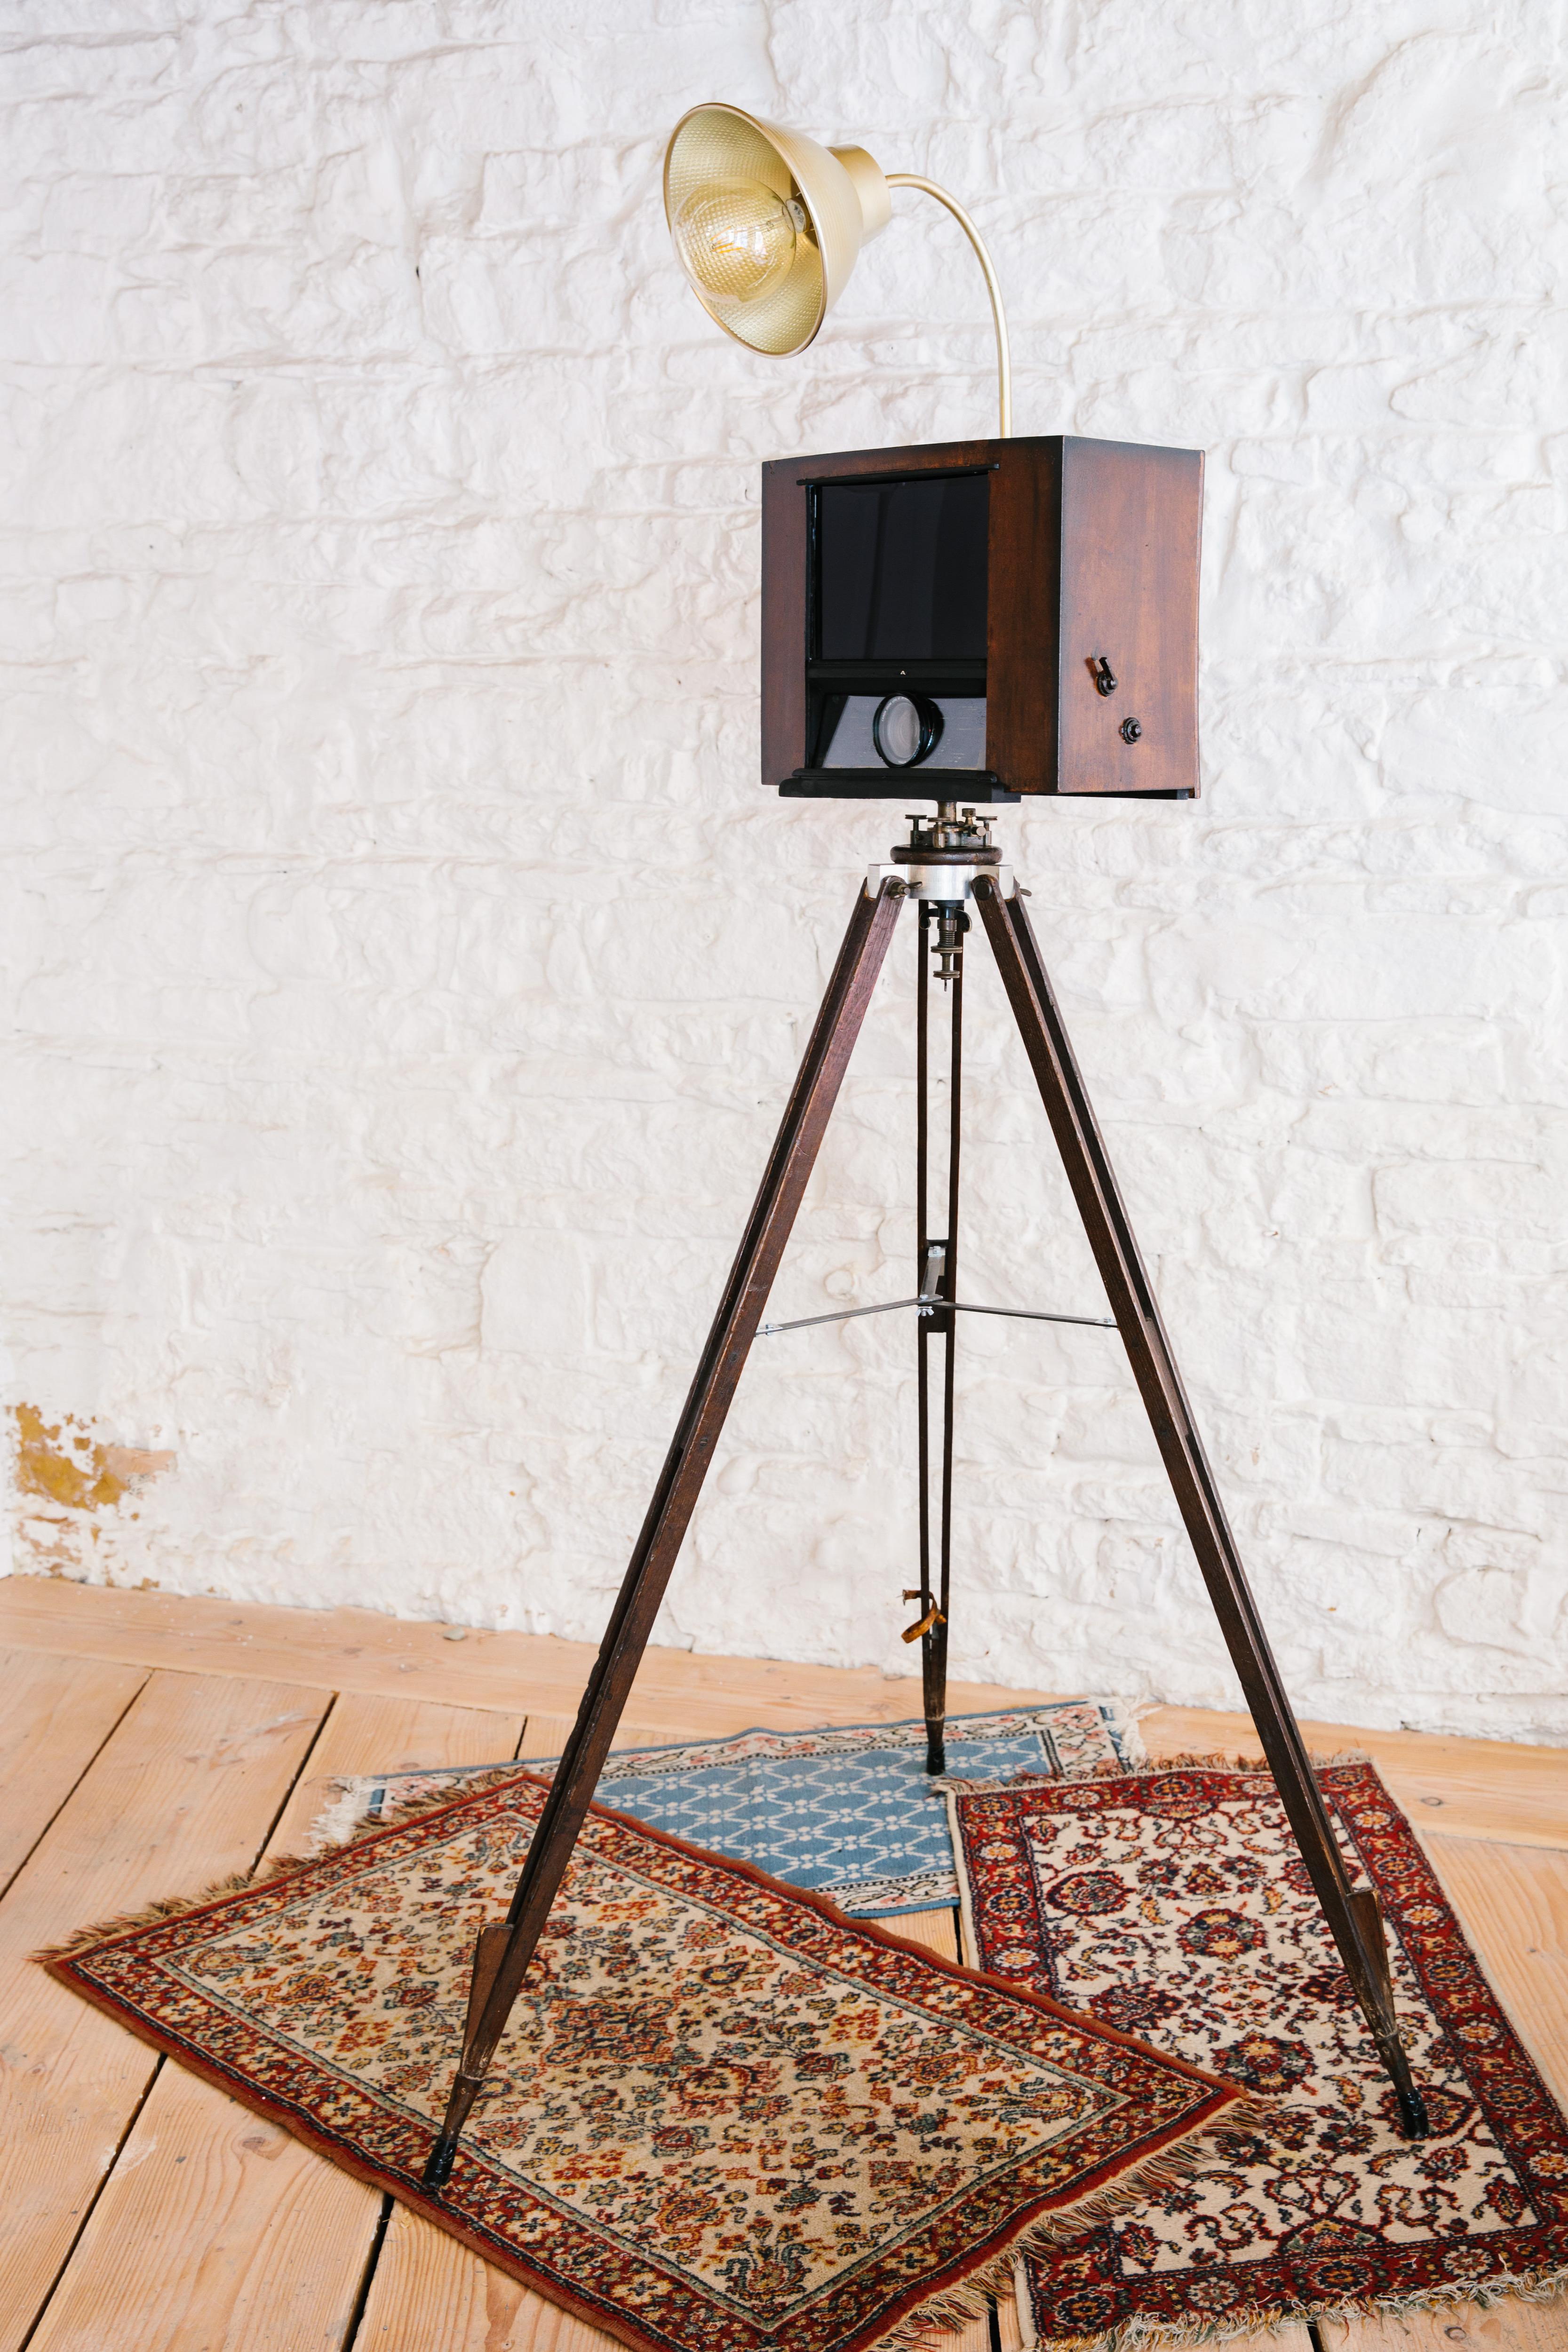 La RétroBox, Photobox vintage, Photobooth vintage